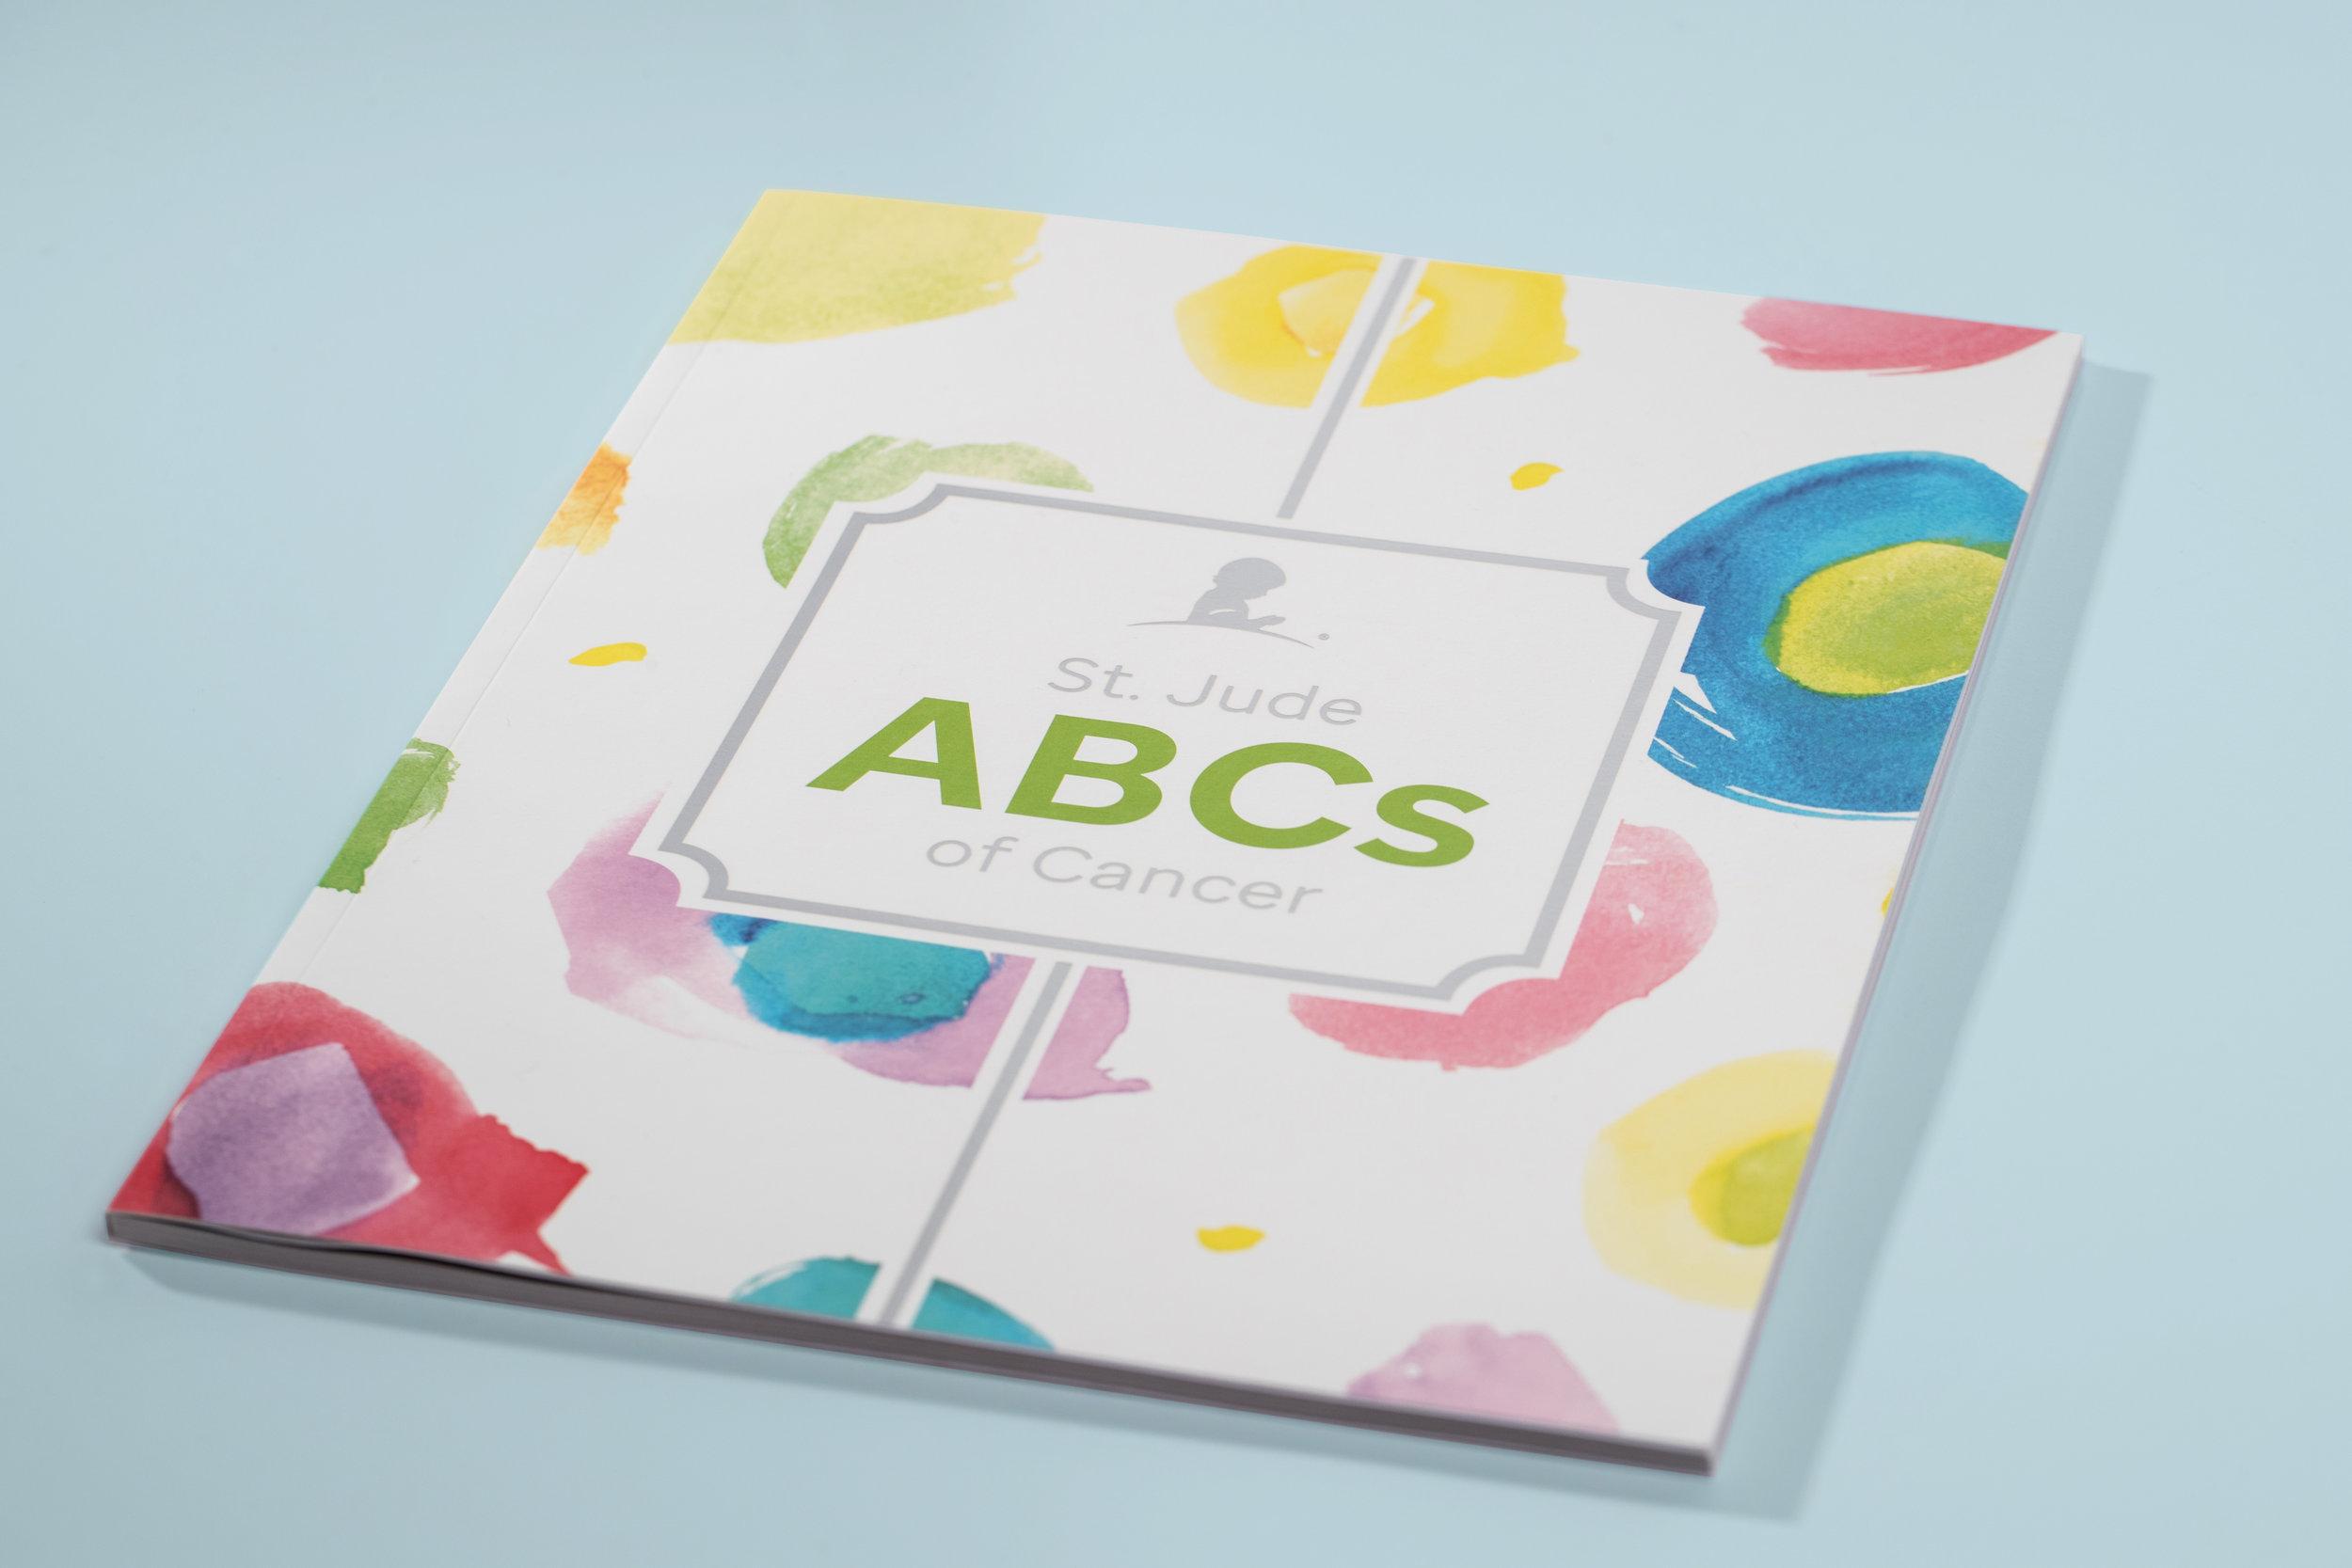 180906_ABCsBook_mb002-v3.jpg